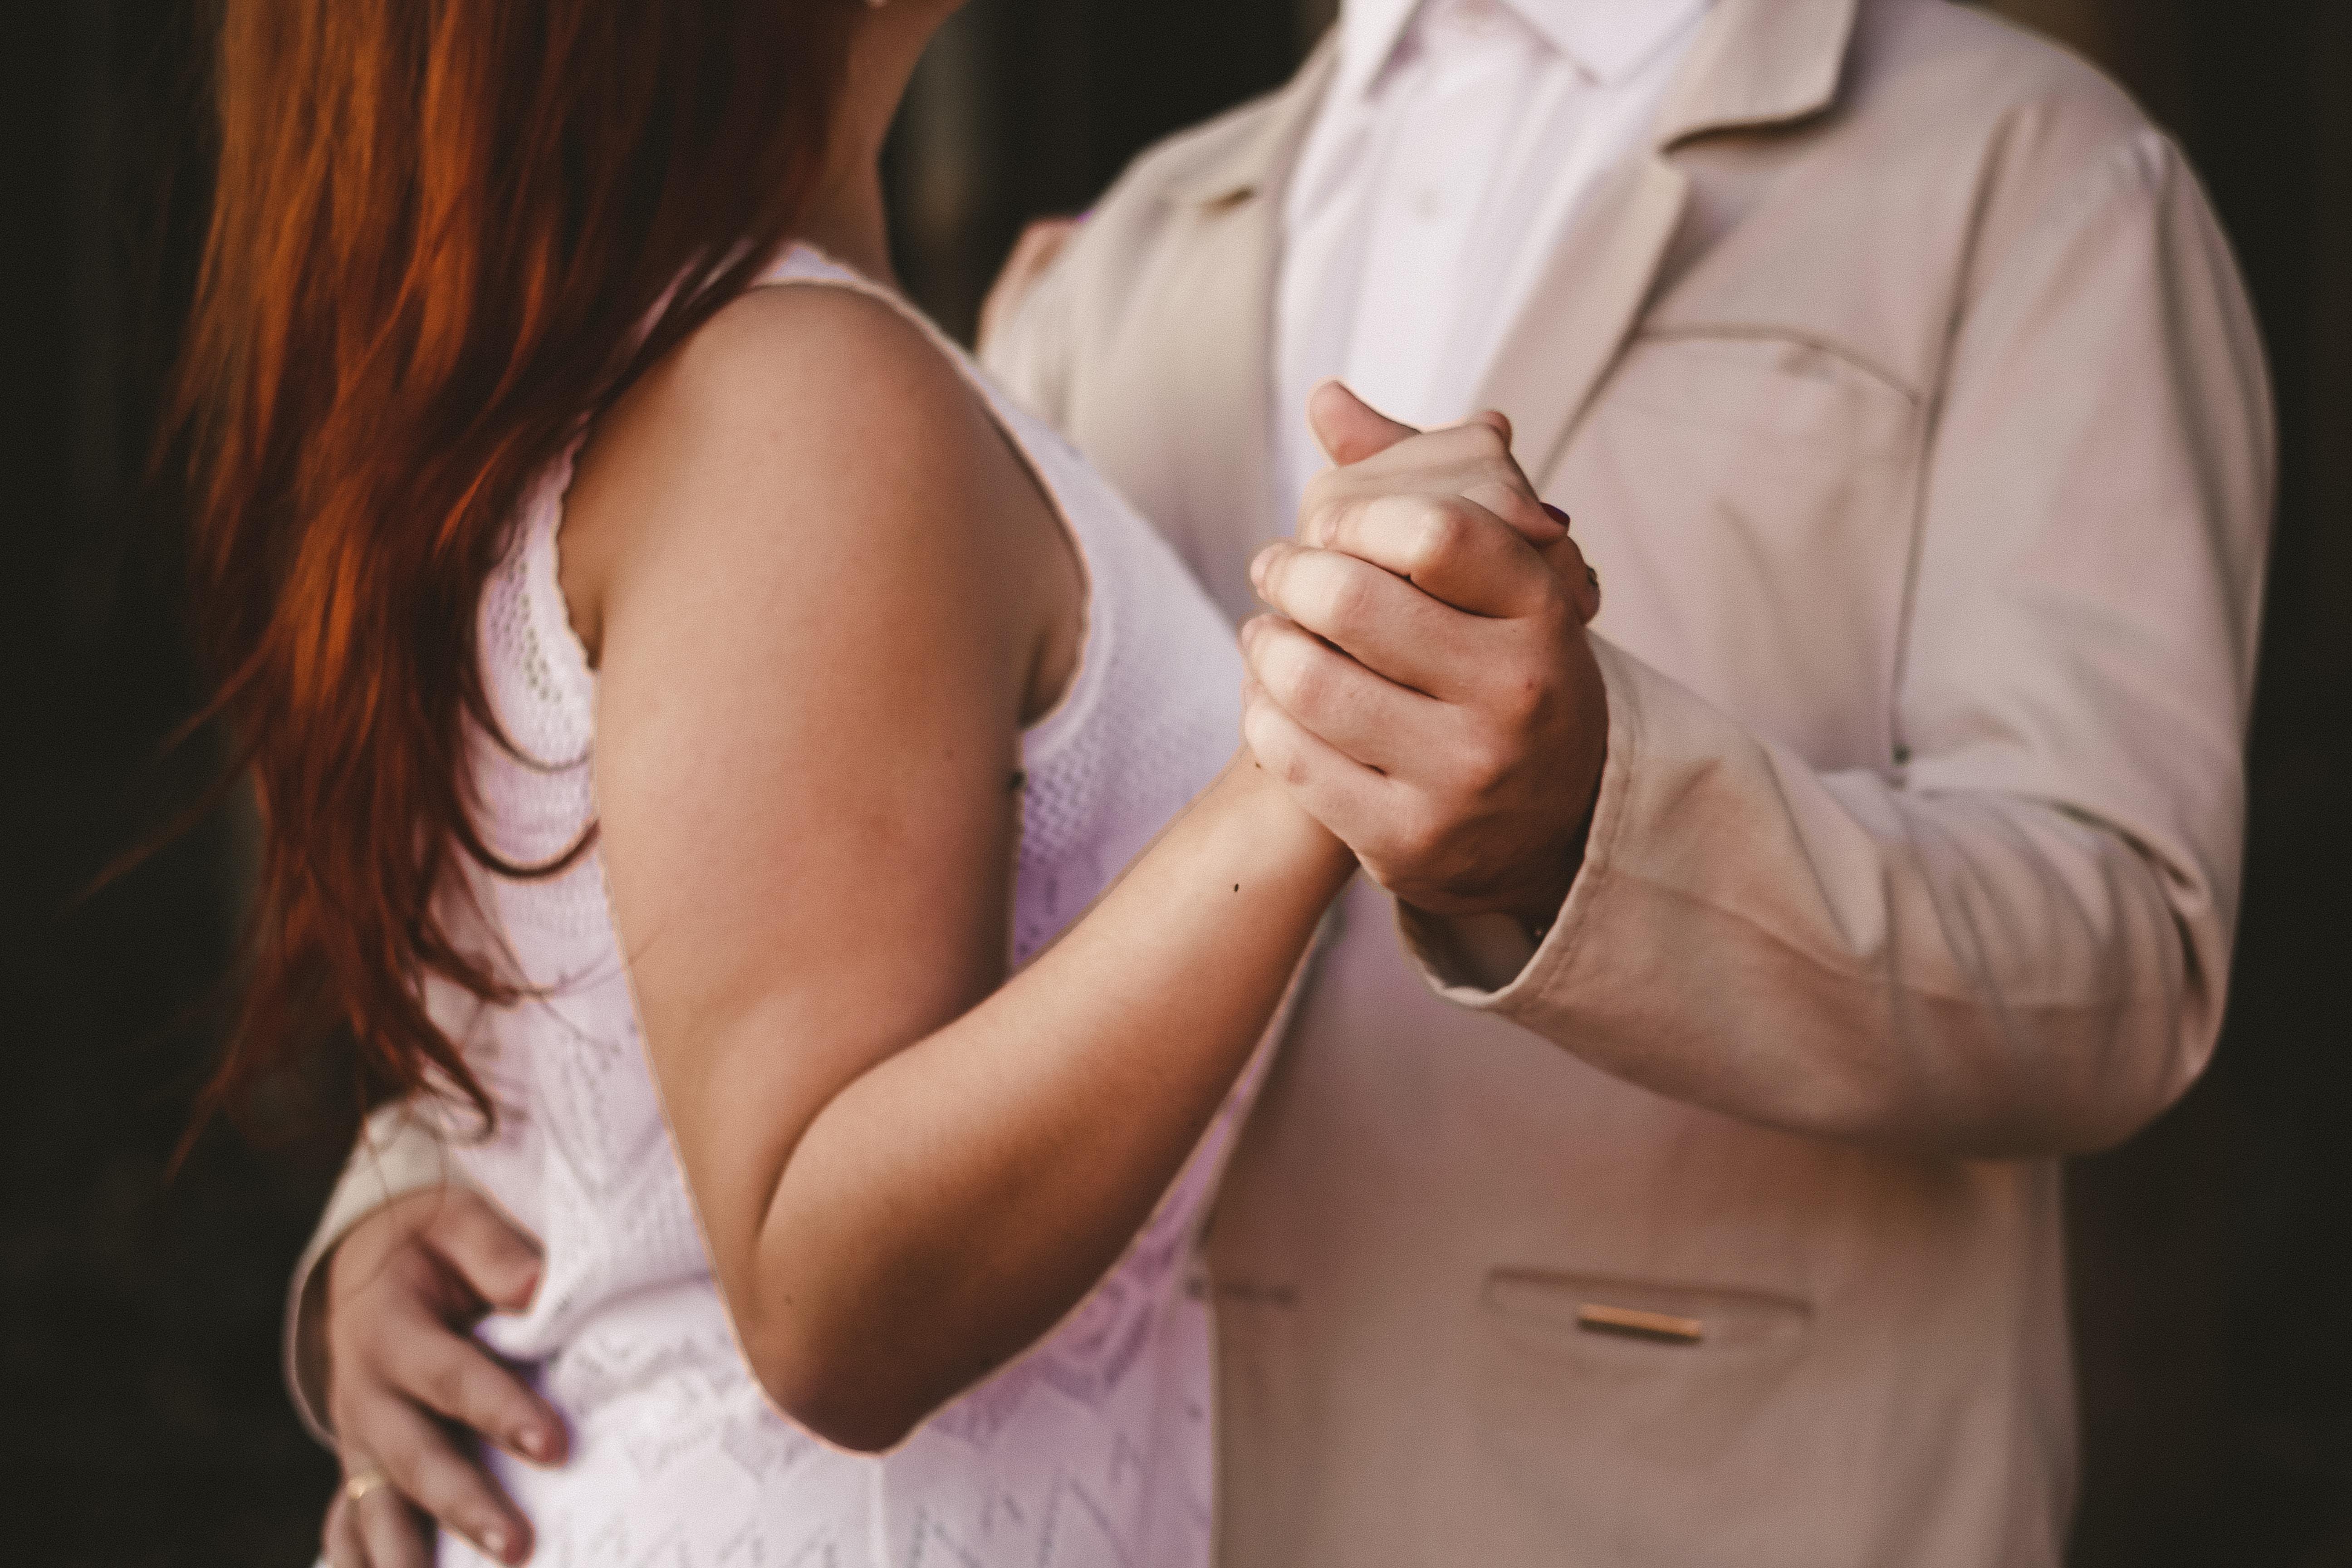 Matrimonial dance on a wedding dance floor